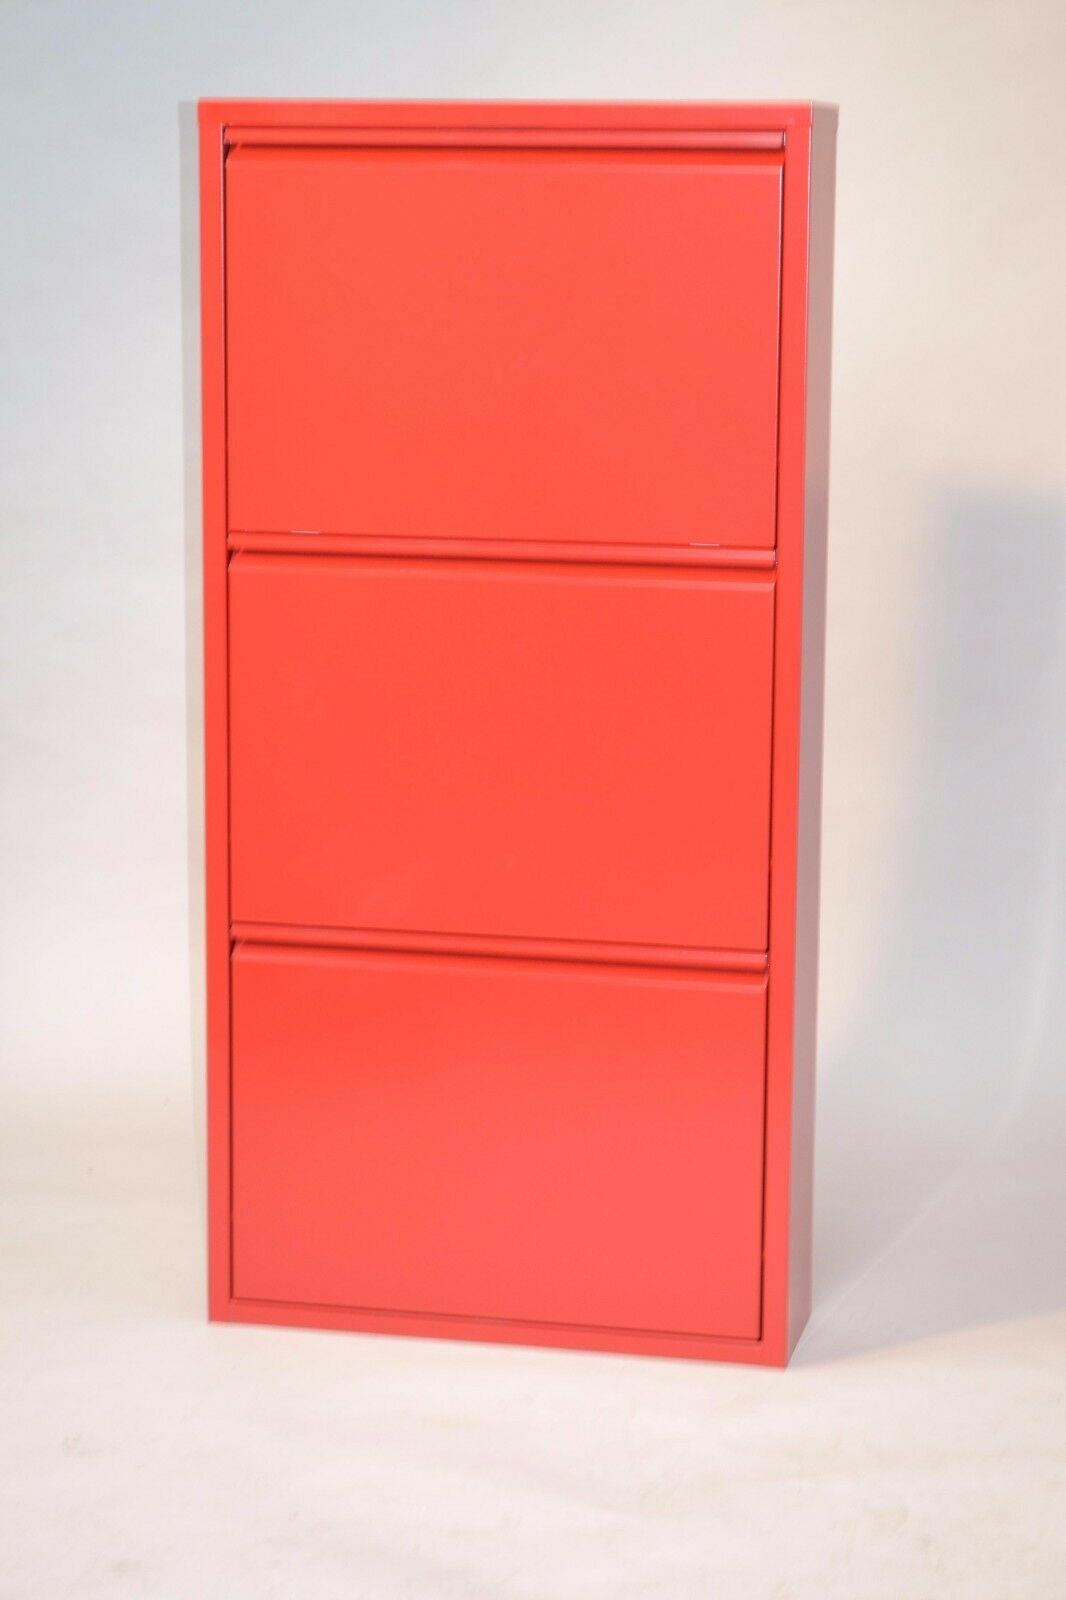 metall schuhschrank rot 3 klappen schuhkipper schuhregal. Black Bedroom Furniture Sets. Home Design Ideas